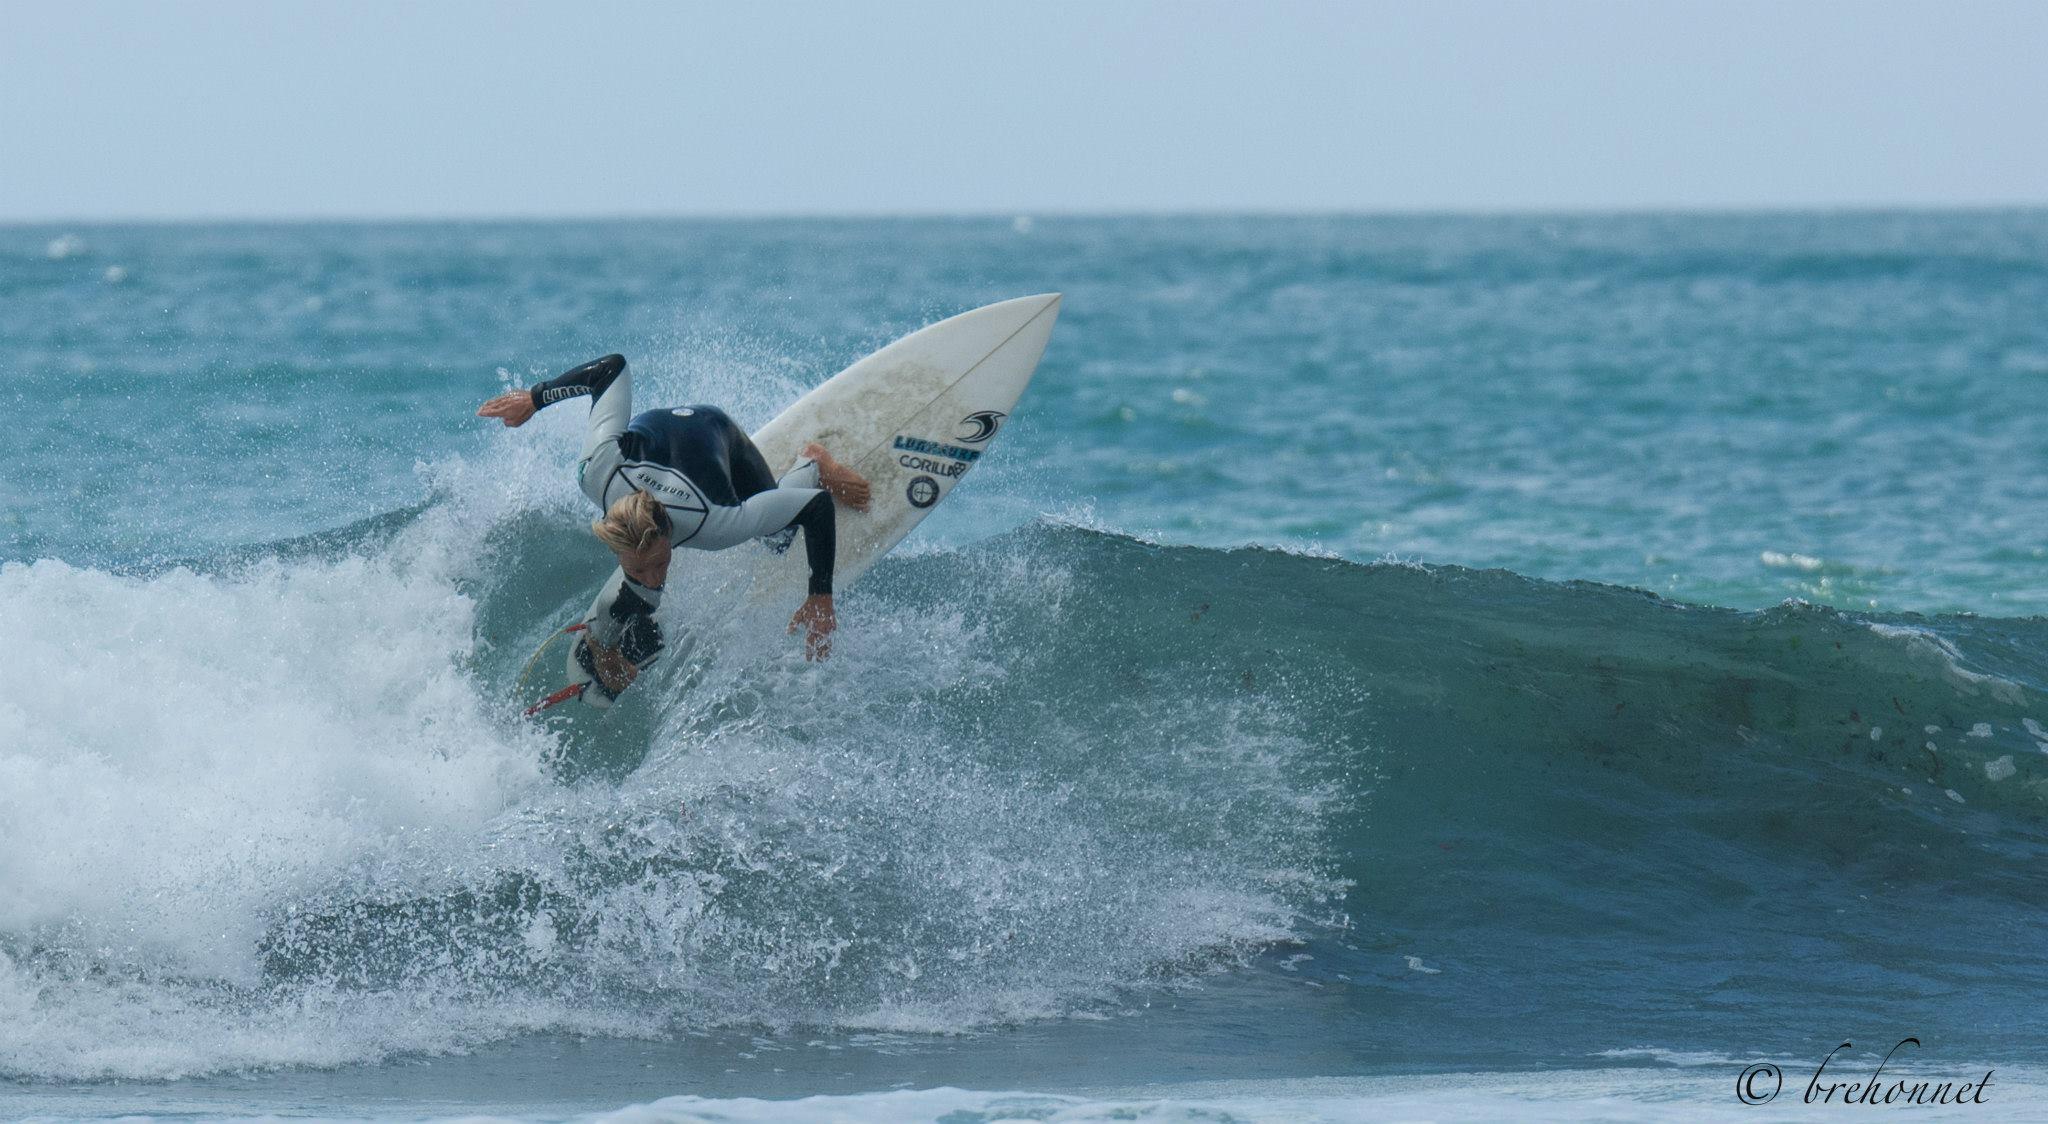 Thomas-Joncour-Lunasurf-Hybrid-wetsuit-by-Mich-Brehonnet